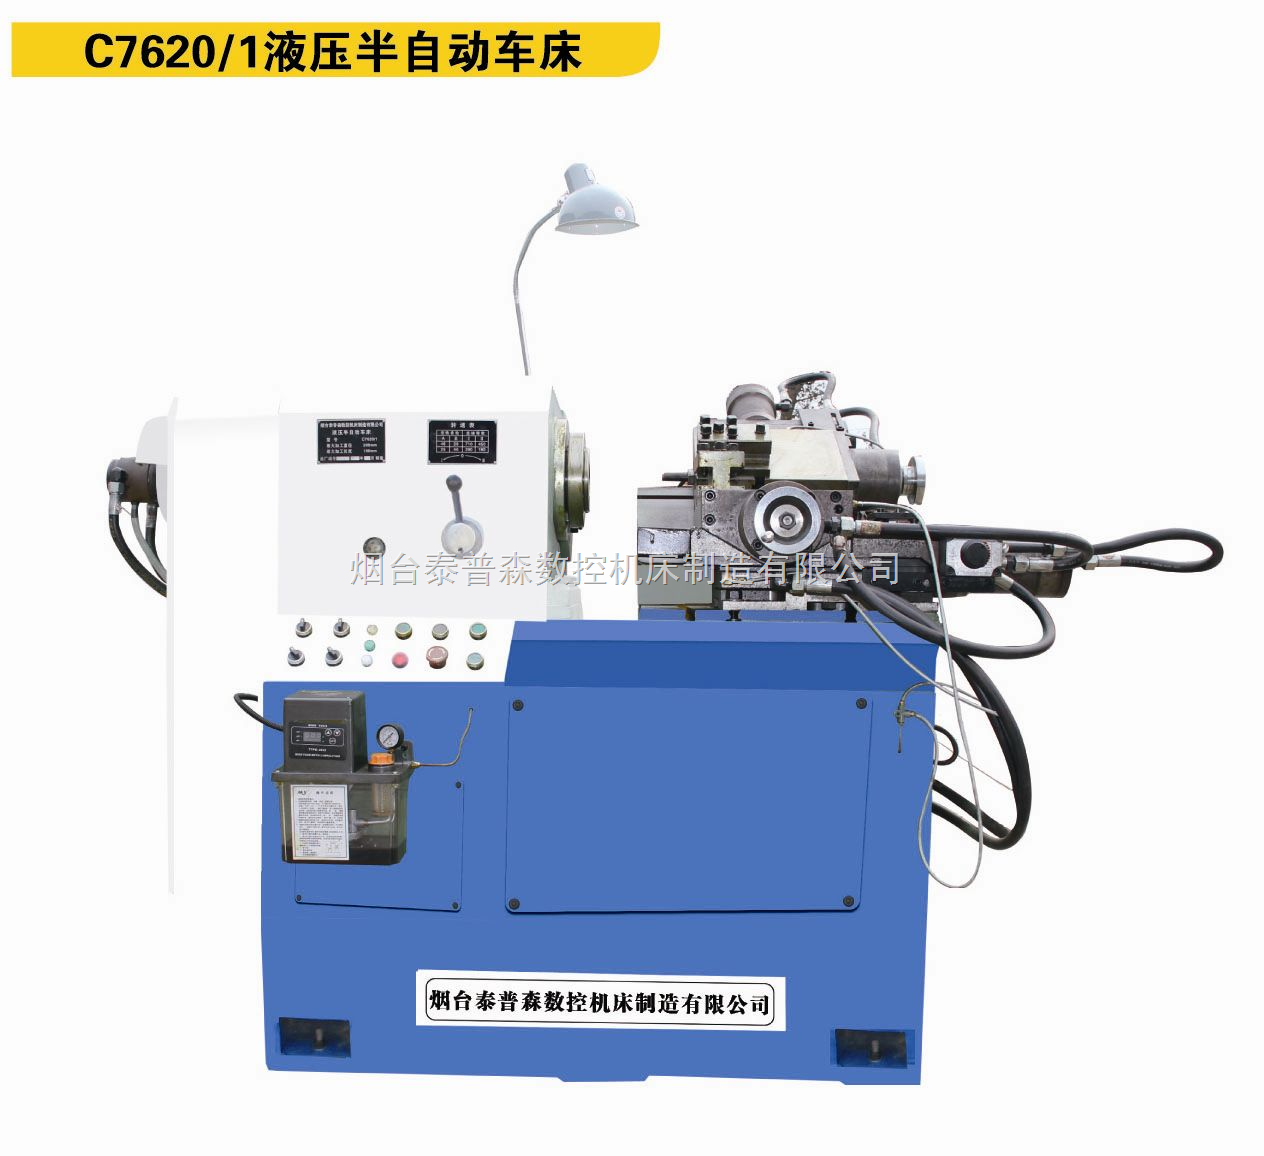 c7620-1轴承液压半自动车床图片